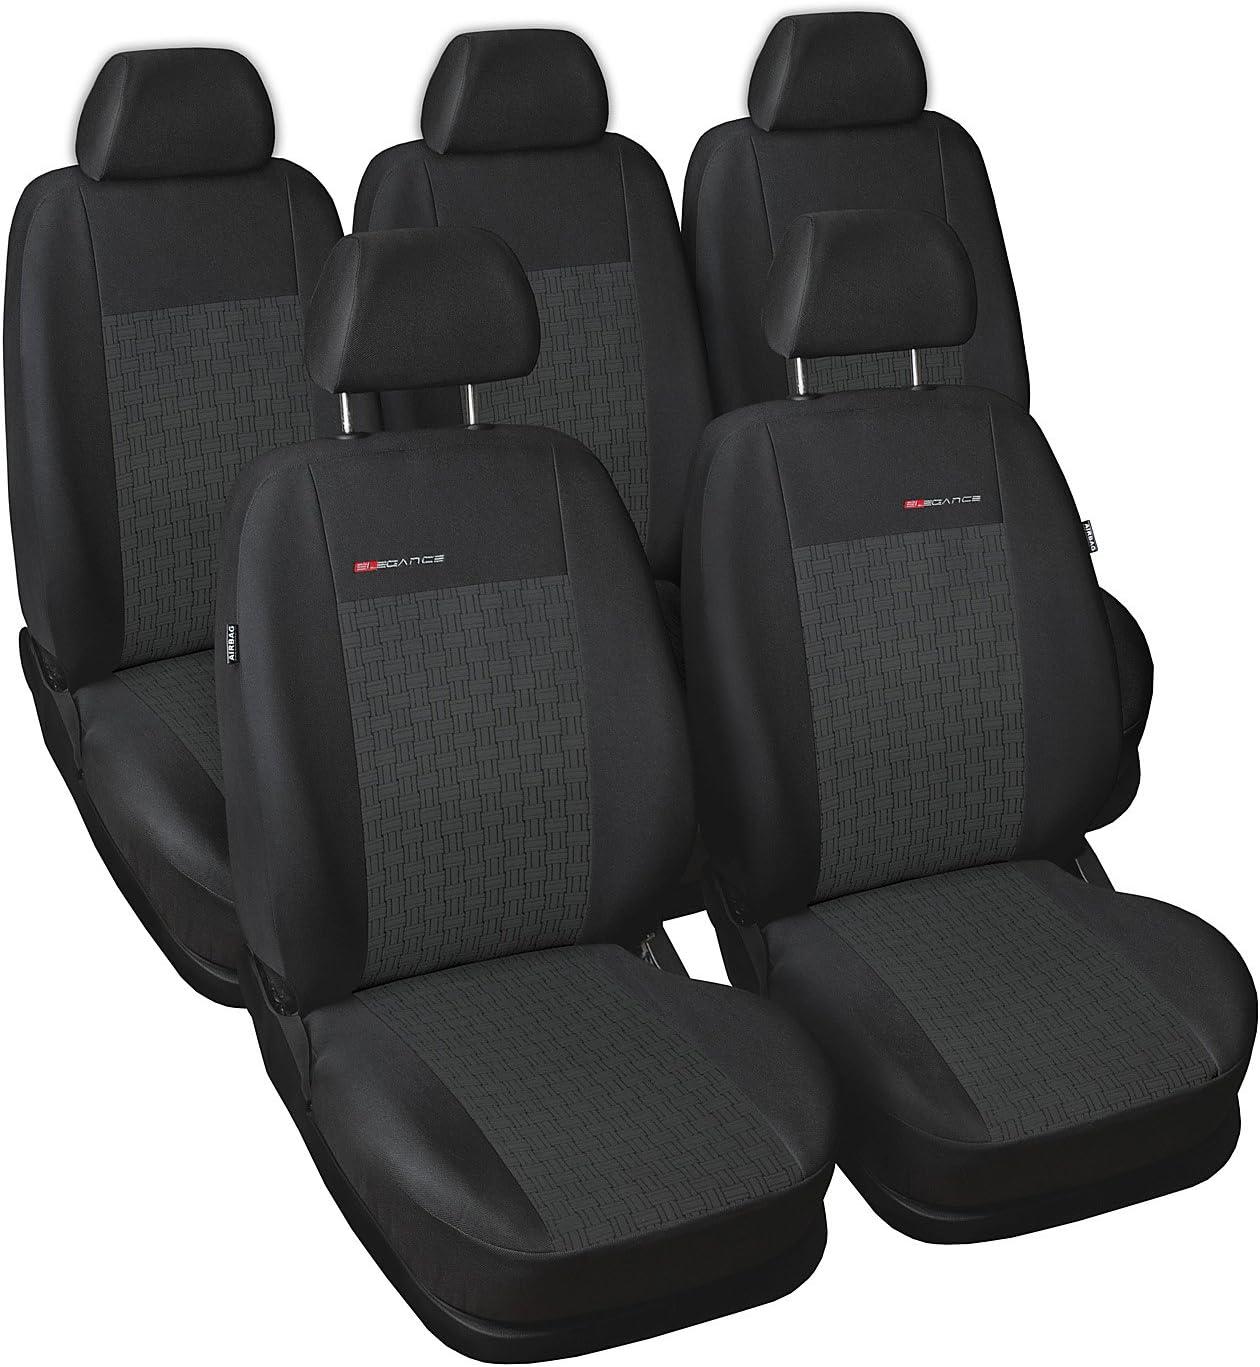 EJP Ma/ßgefertigtes Autositzbezugset f/ür CX-5 II-Generation ab 2017 Beige Individuell gefertigt .Design S-Type Kunstleder